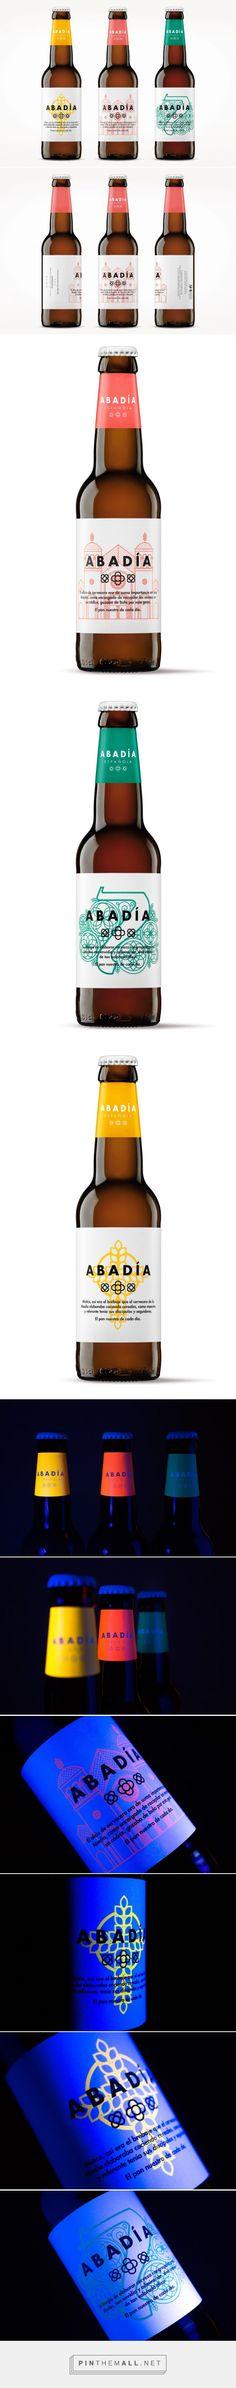 Abbeys (Las Abadías) Packaging of the World - Creative Package Design Gallery - http://www.packagingoftheworld.com/2016/01/abbeys-las-abadias.html